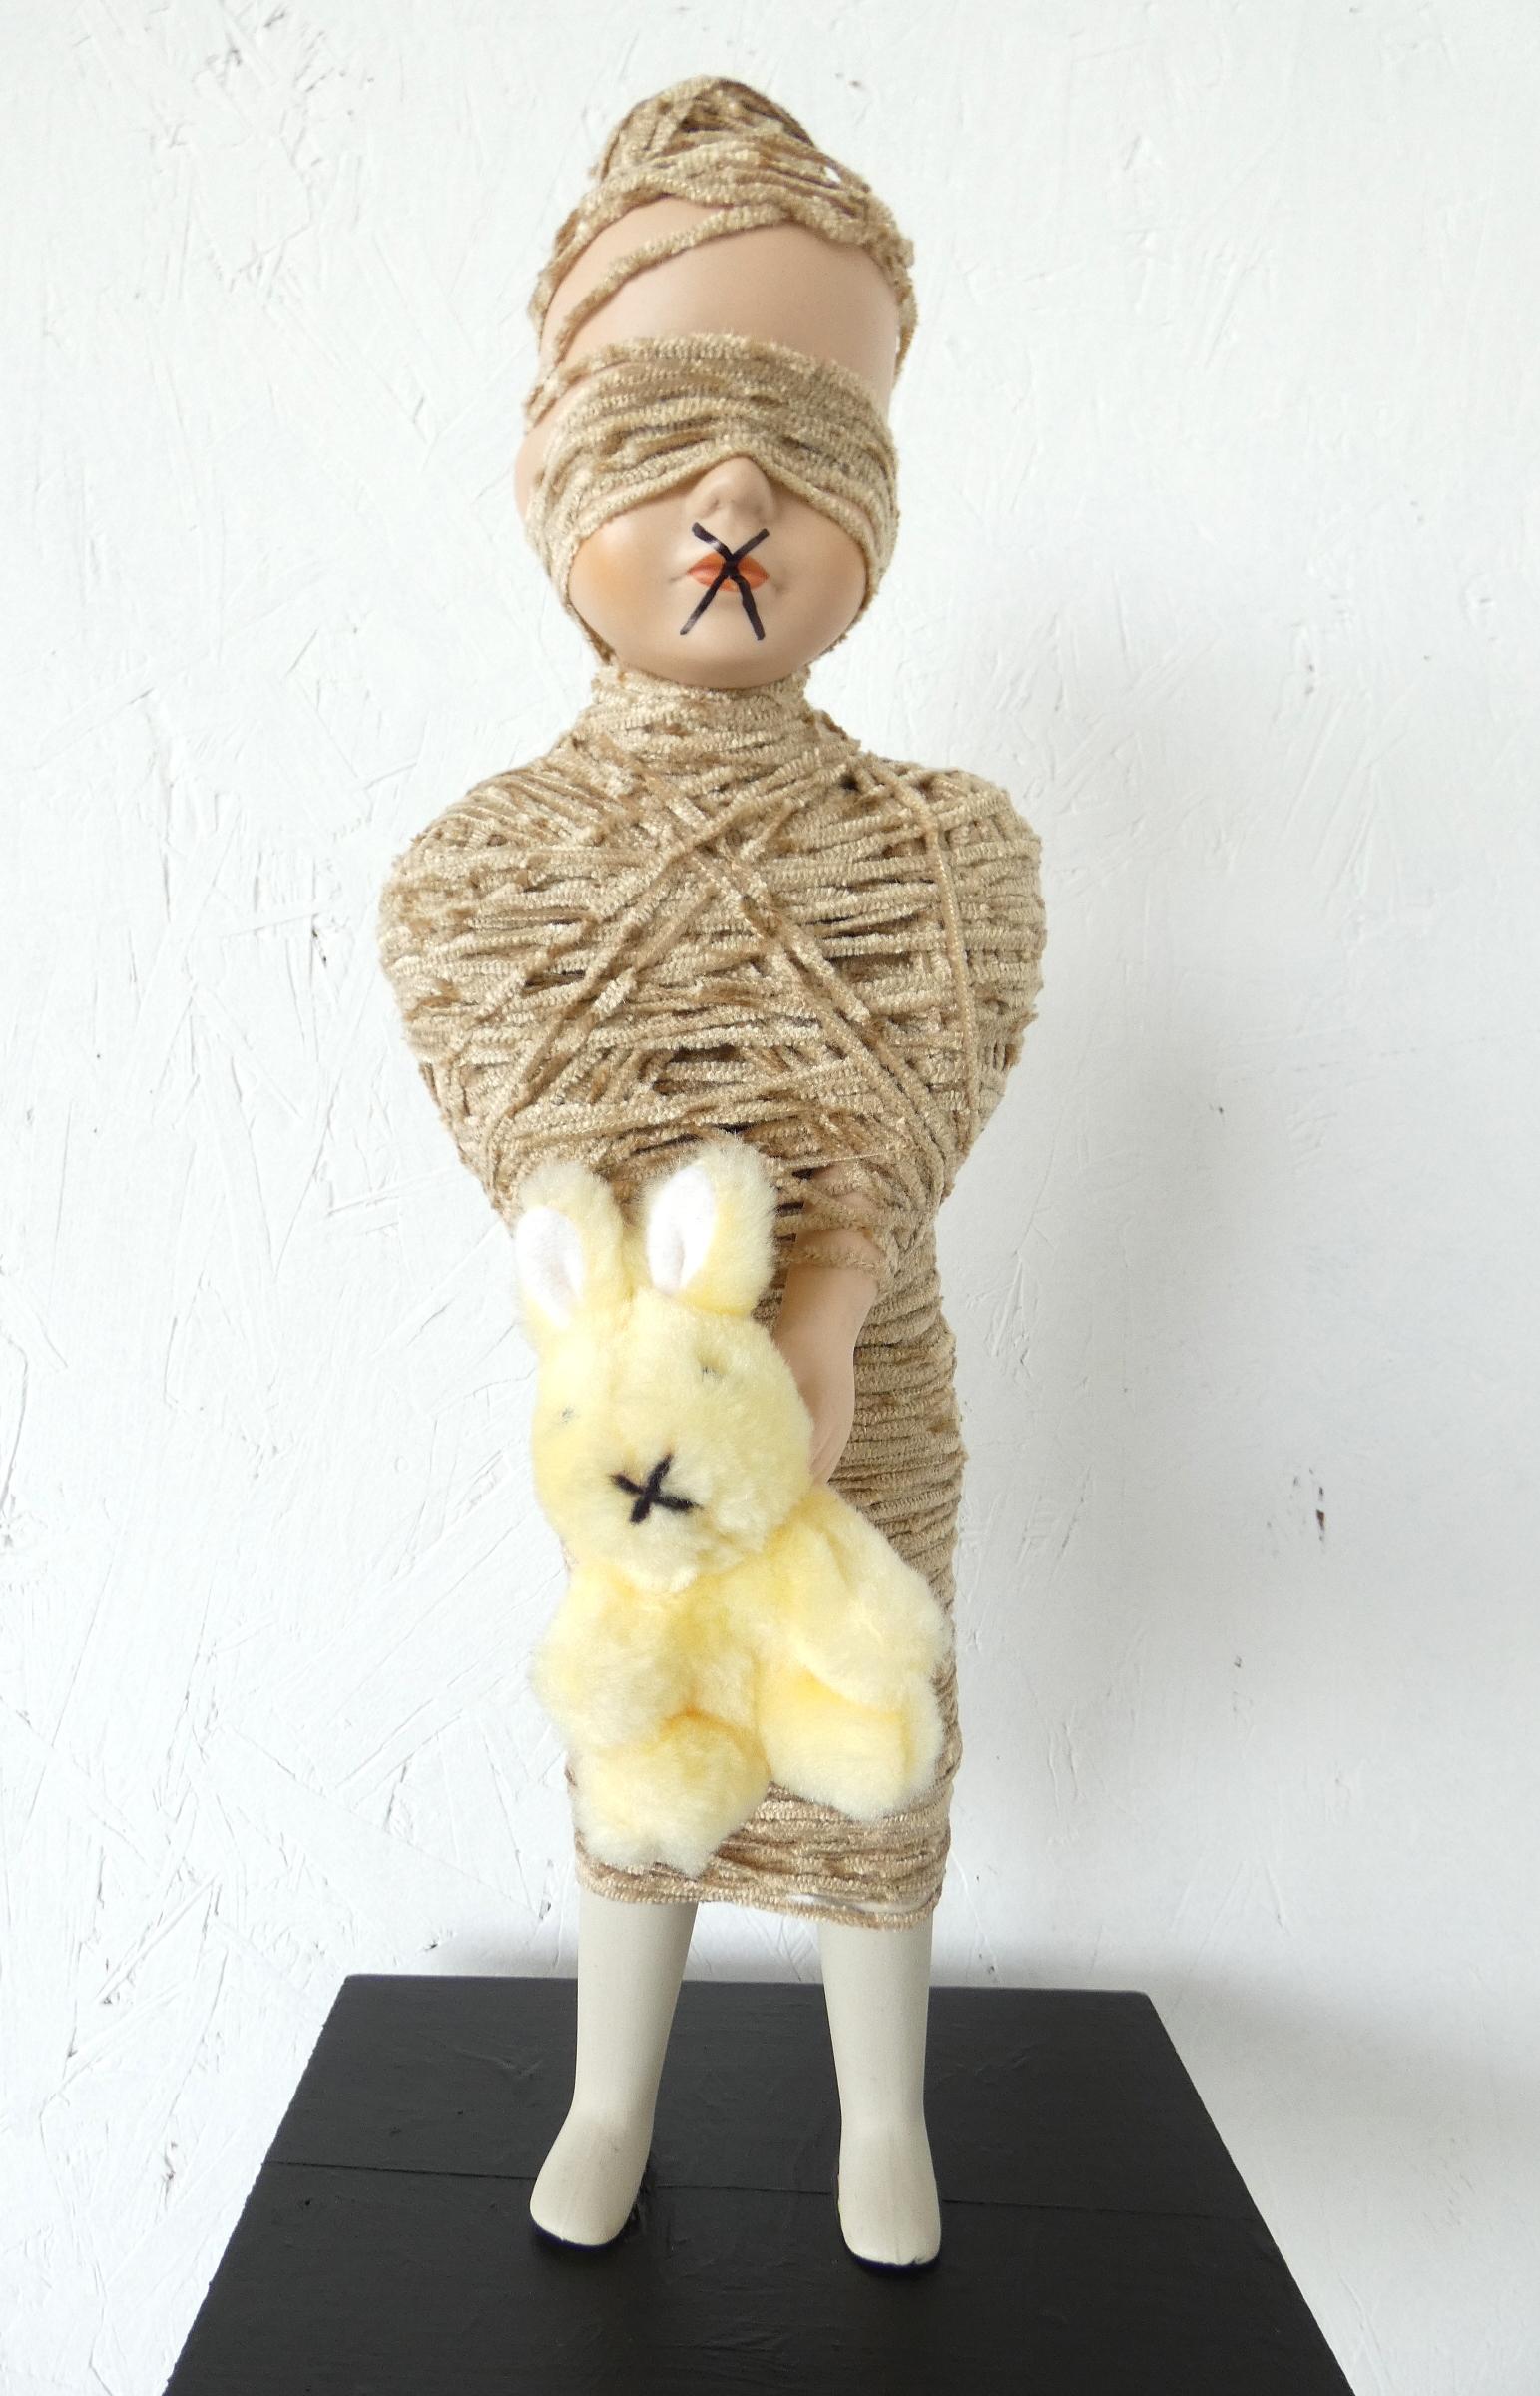 Monddood sculptuur, ruimtelijk werk, artwork, textielkunst, textiel art, dutchartist, kunstenaar Wietske Lycklama à Nijeholt